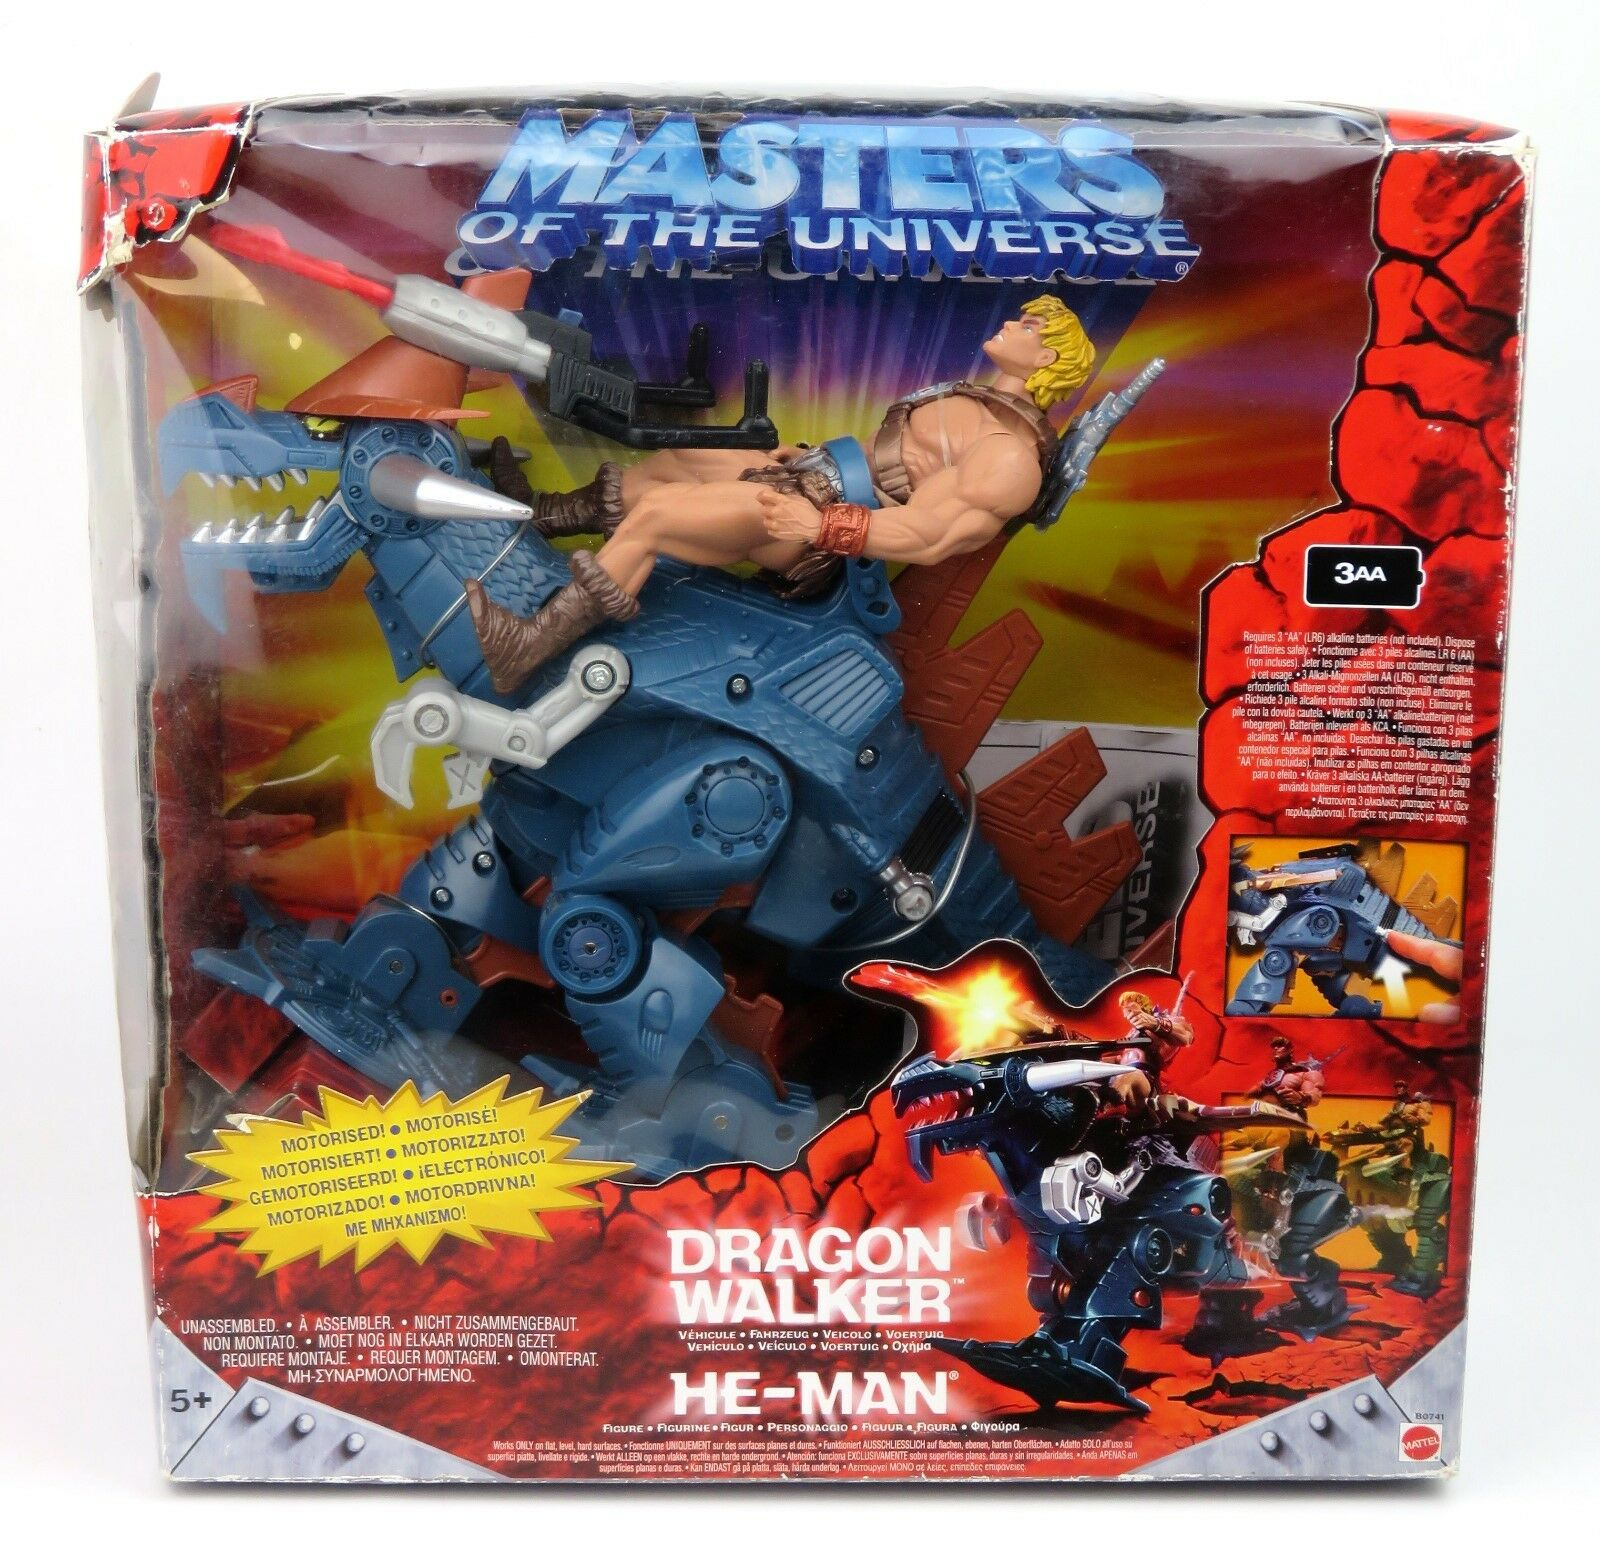 Masters of The Universe MOTU - Dragon Walker Vehicle & He-Man Action Figure